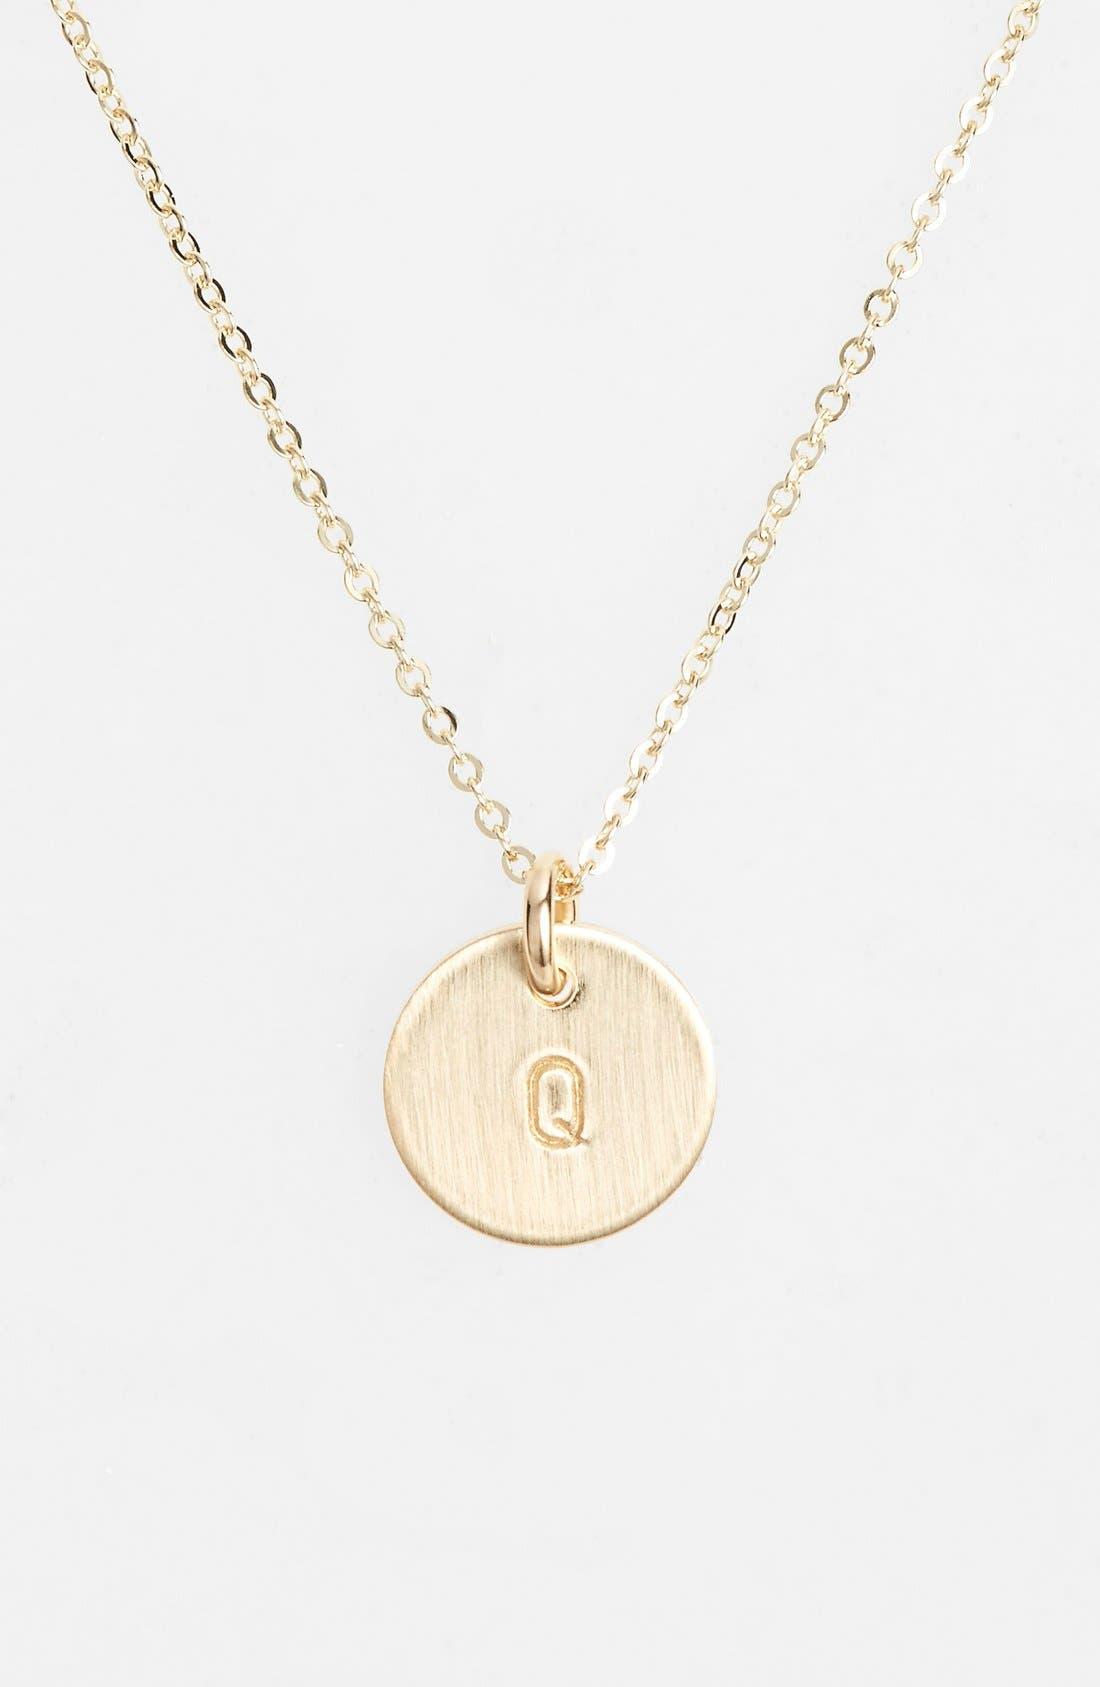 14k-Gold Fill Initial Mini Circle Necklace,                             Main thumbnail 1, color,                             14K Gold Fill Q